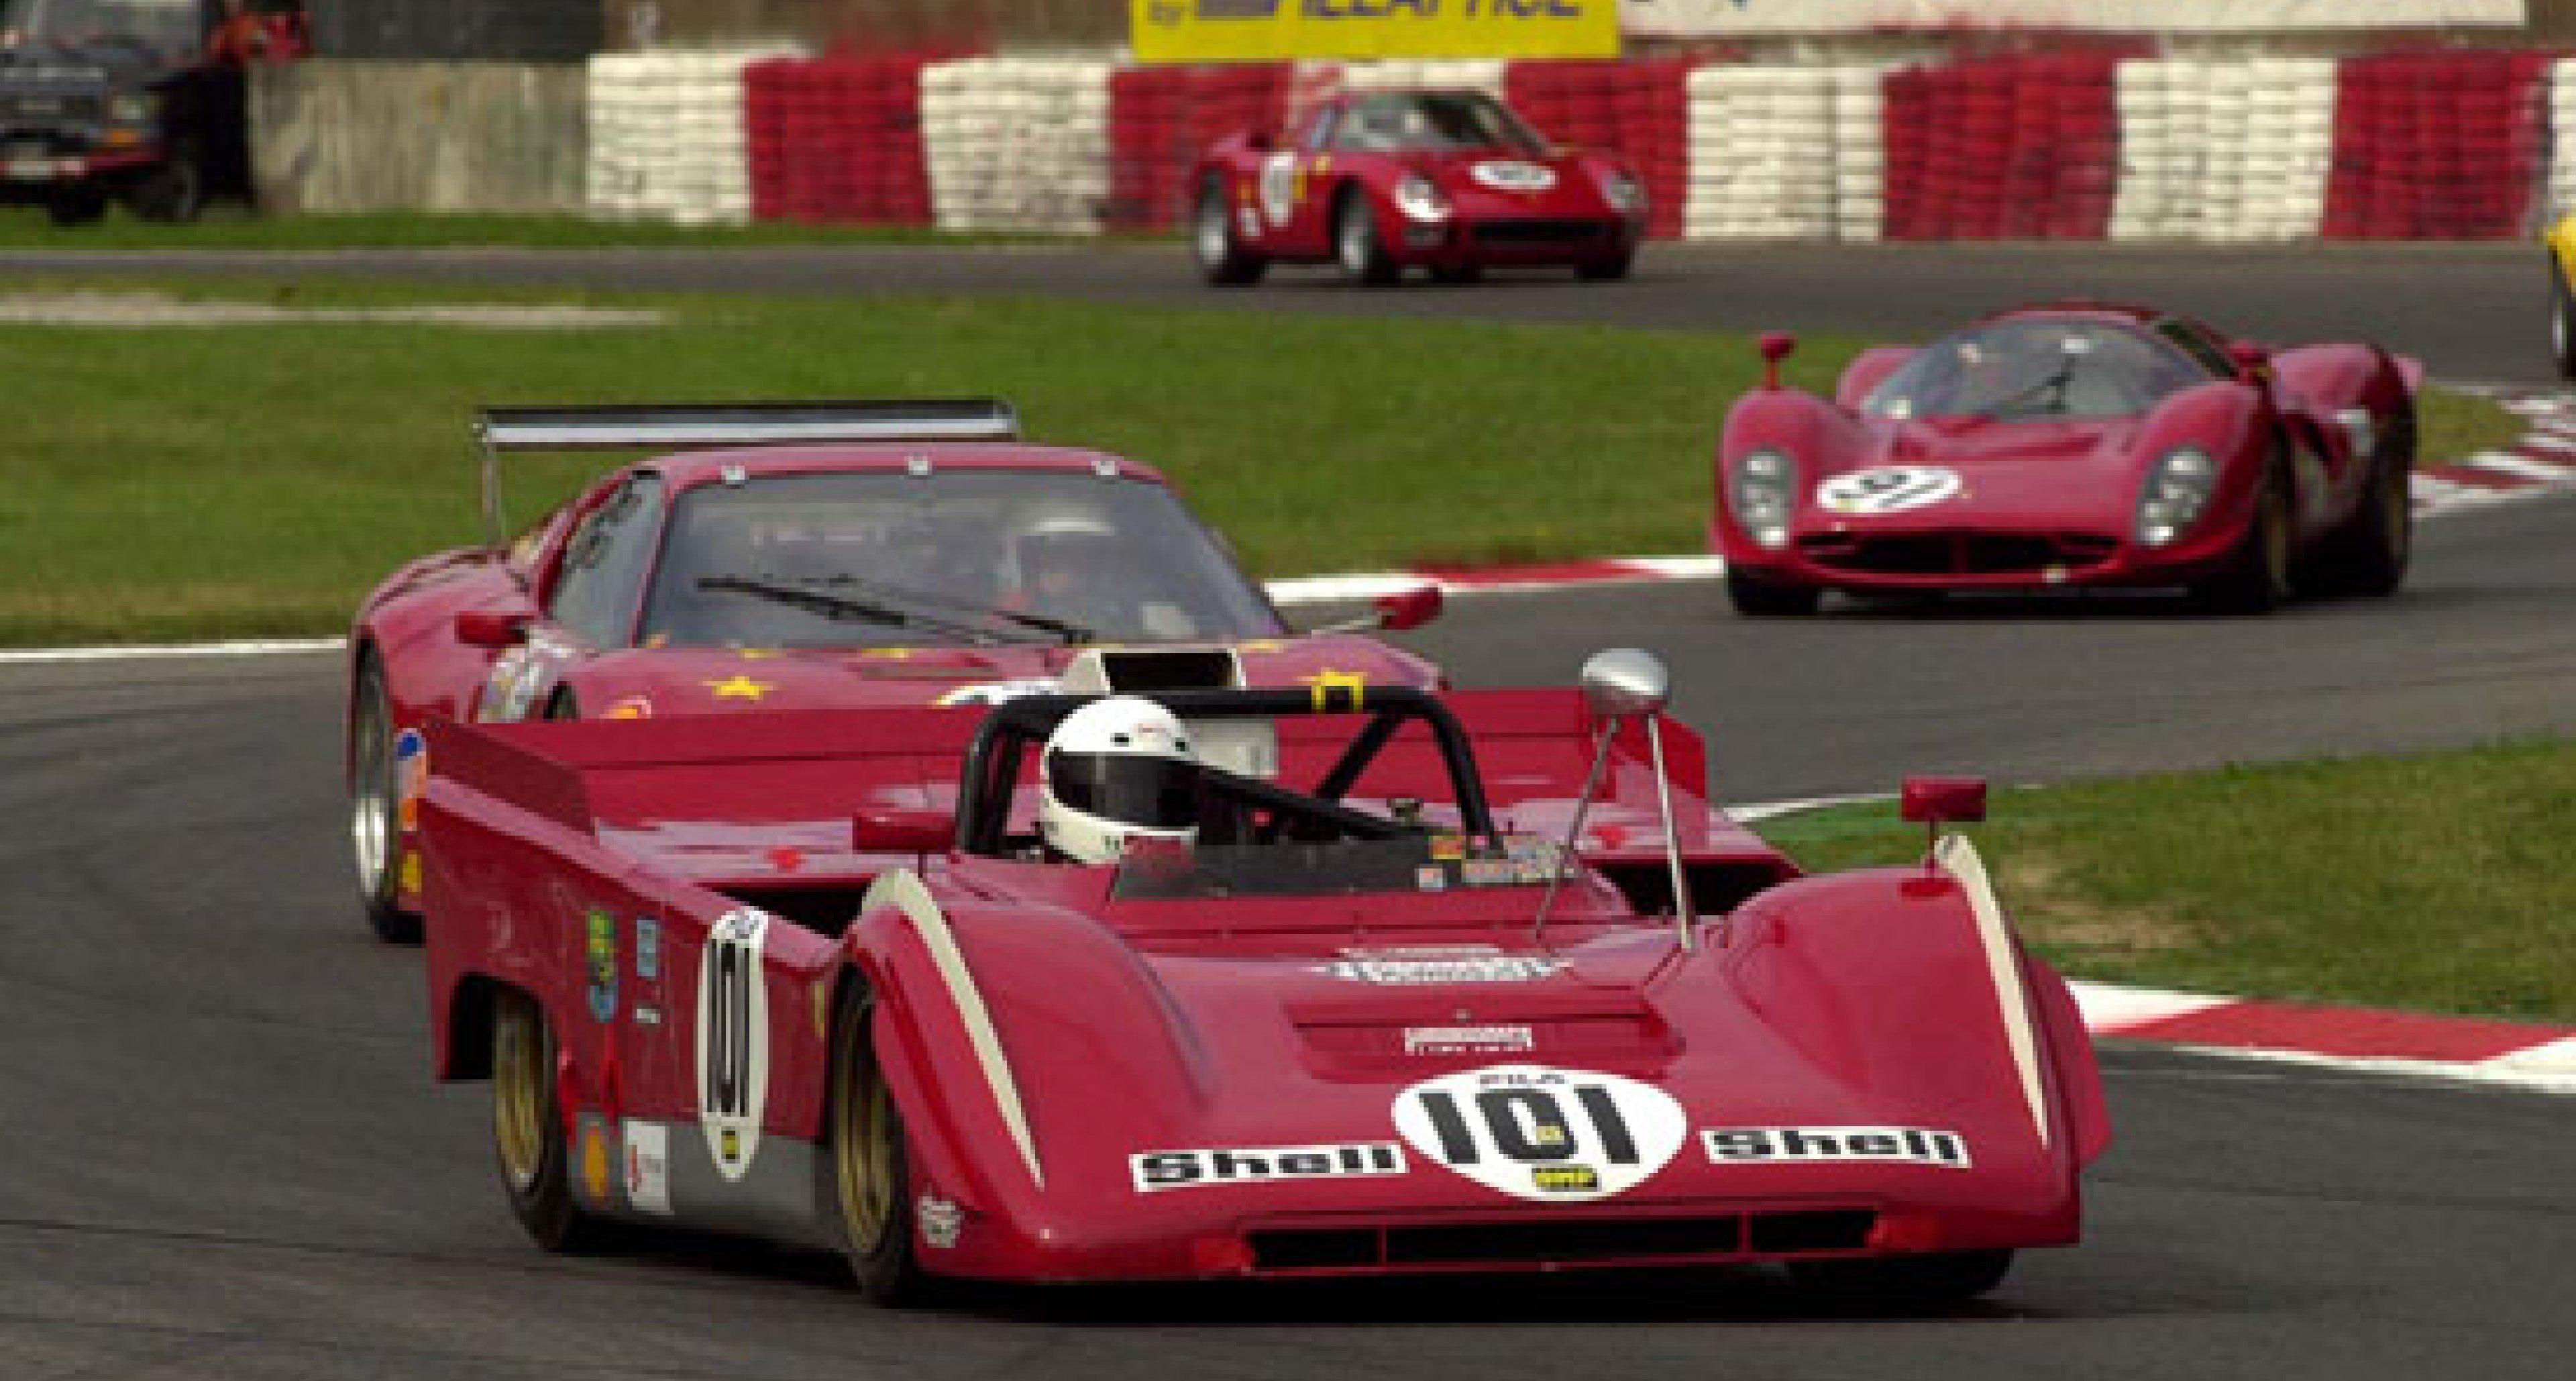 21/22 June Donington Shell Historic Ferrari and Maserati